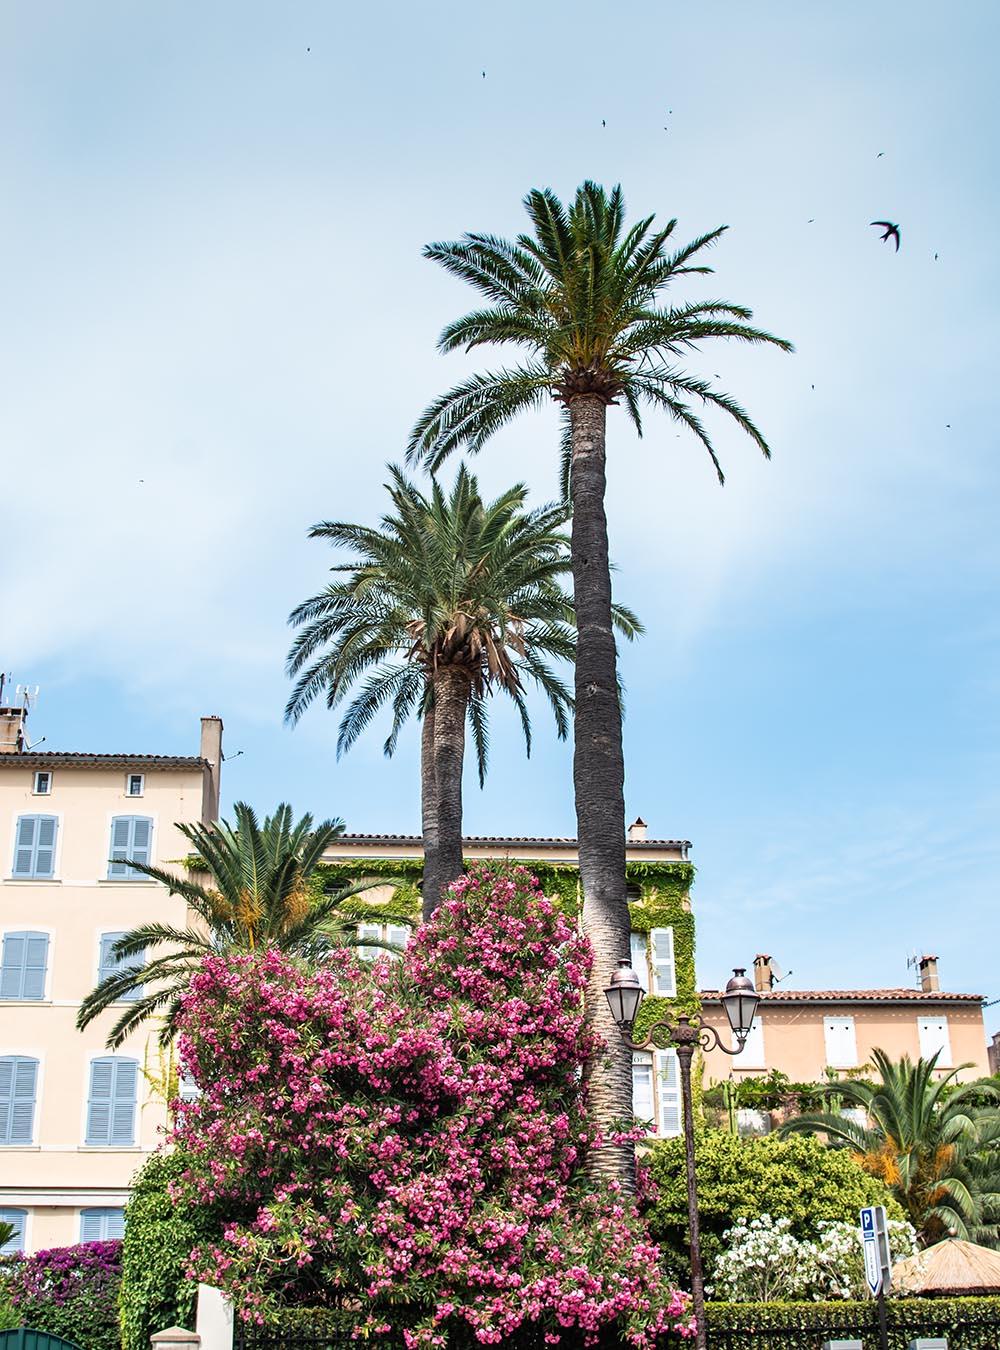 Sommer an der Côte d'Azur Saint-Tropez